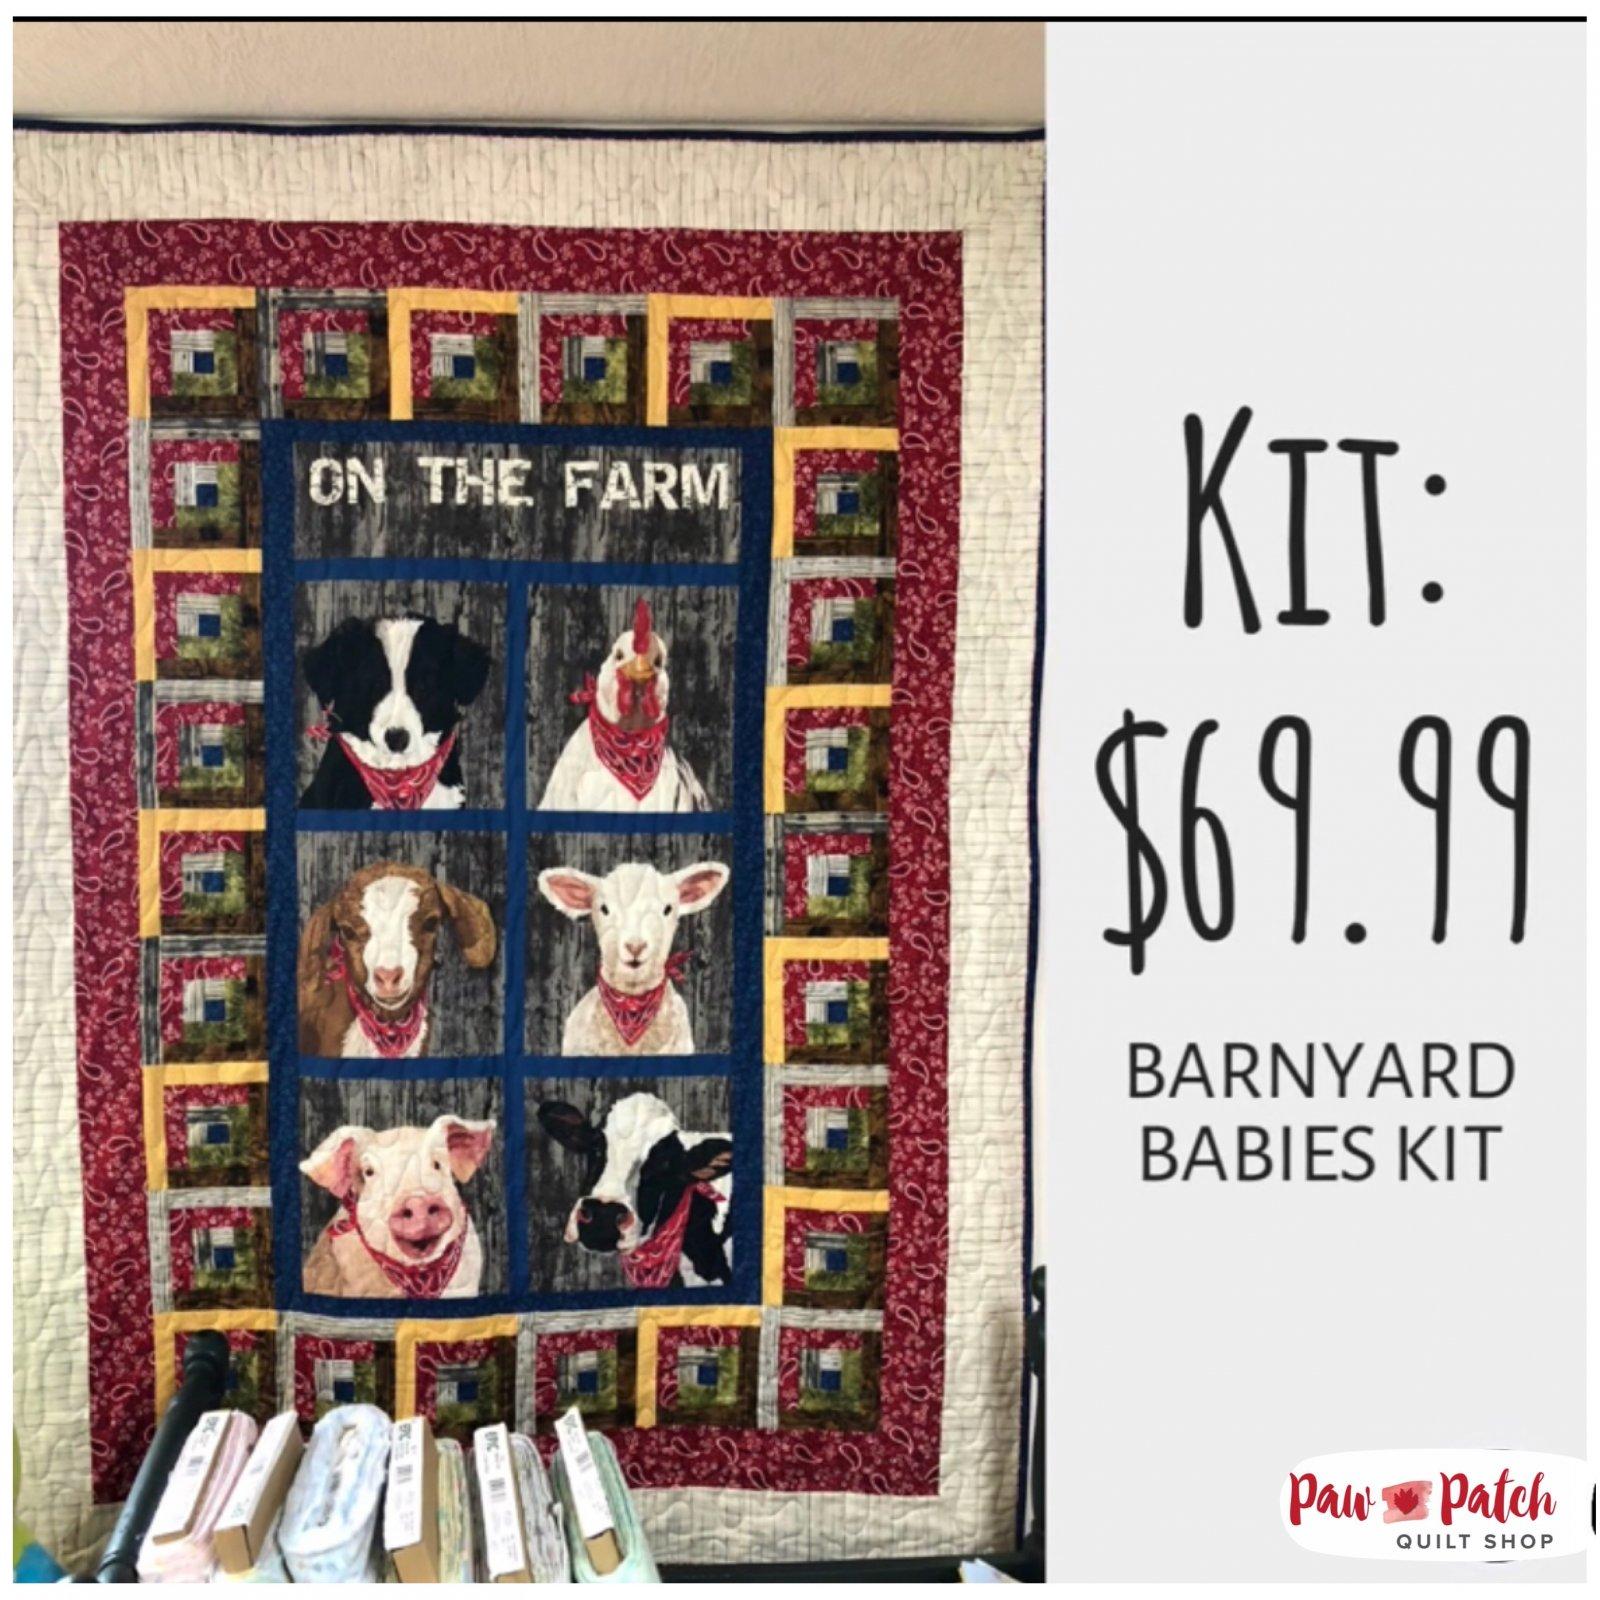 Barnyard Babies Kit